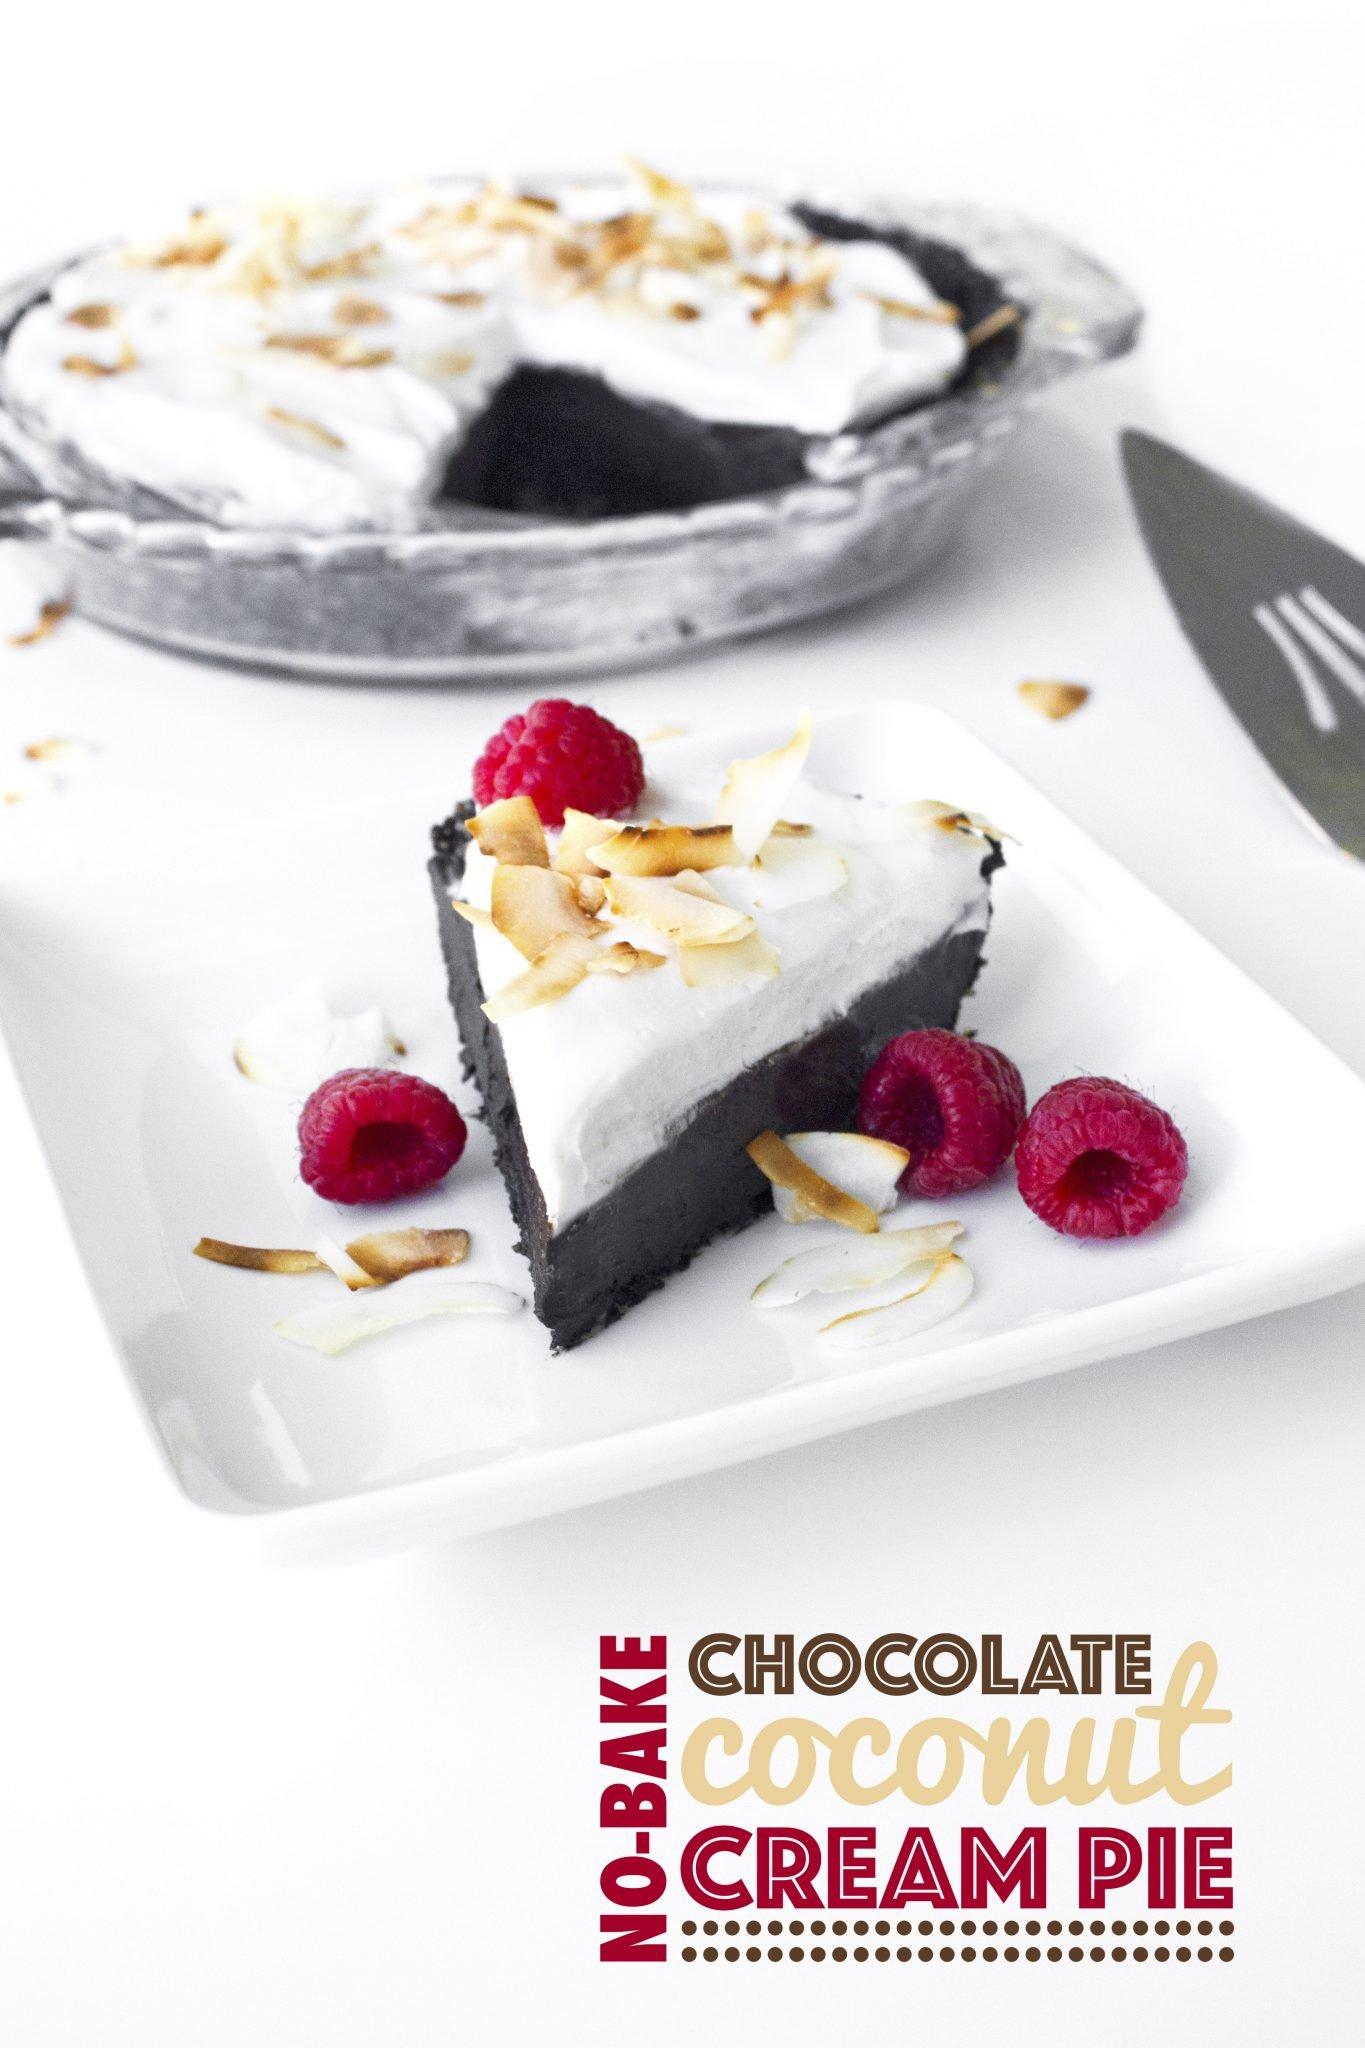 Chocolate Coconut Cream Pie - Wifemamafoodie